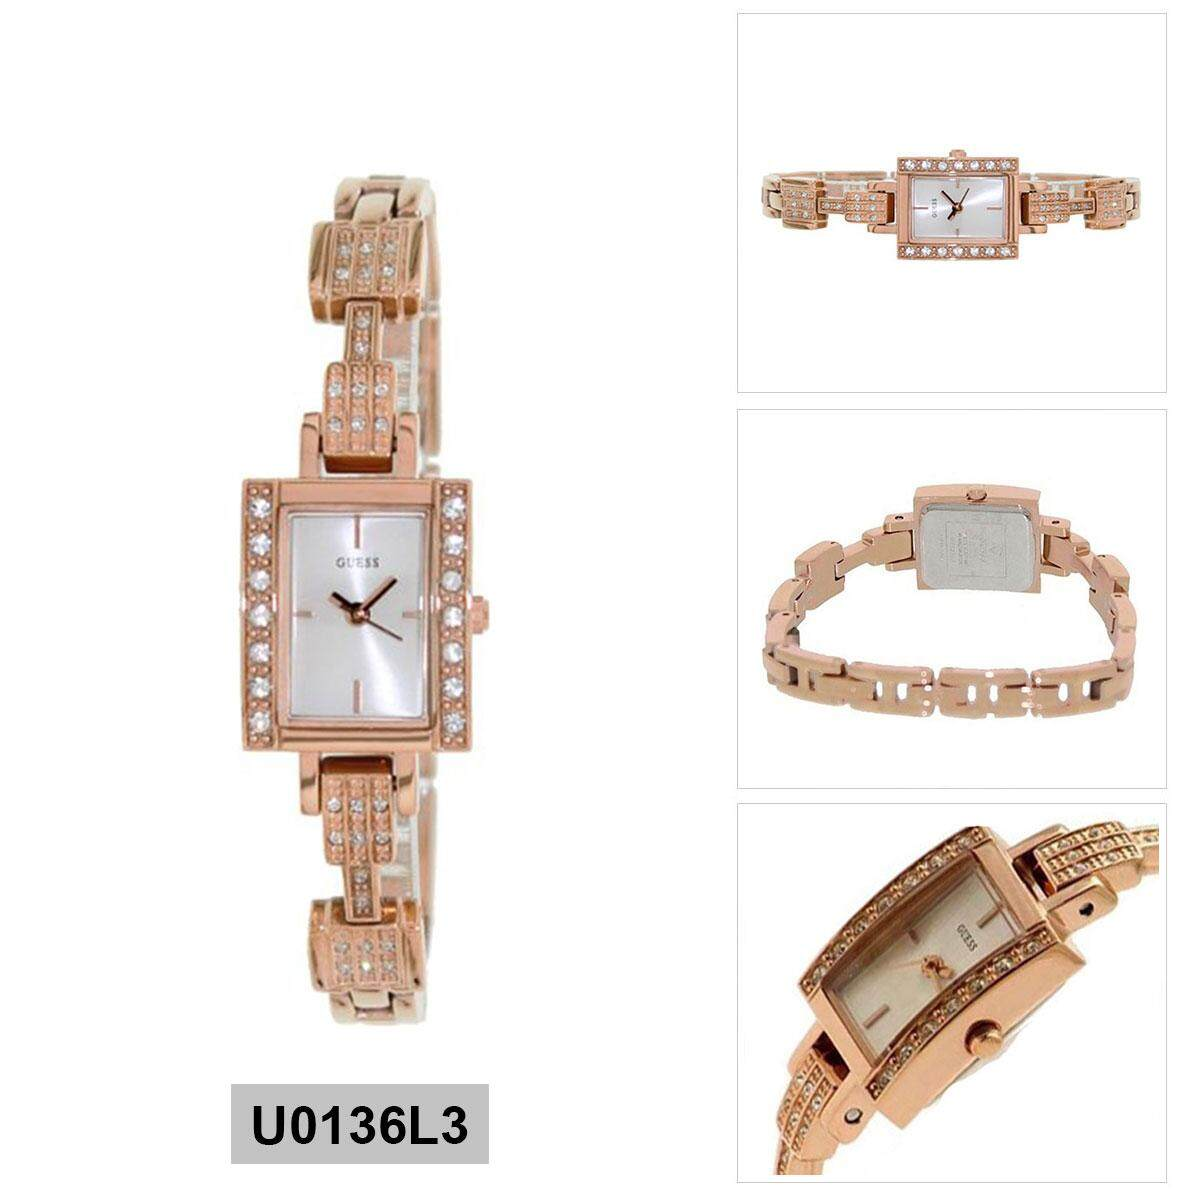 Guess Watches Price In Malaysia Best Lazada W0335l3 Multifunction Jam Tangan Wanita Rosegold Stainless Steel Quartz Gold Case Bracelet Ladies U0136l3